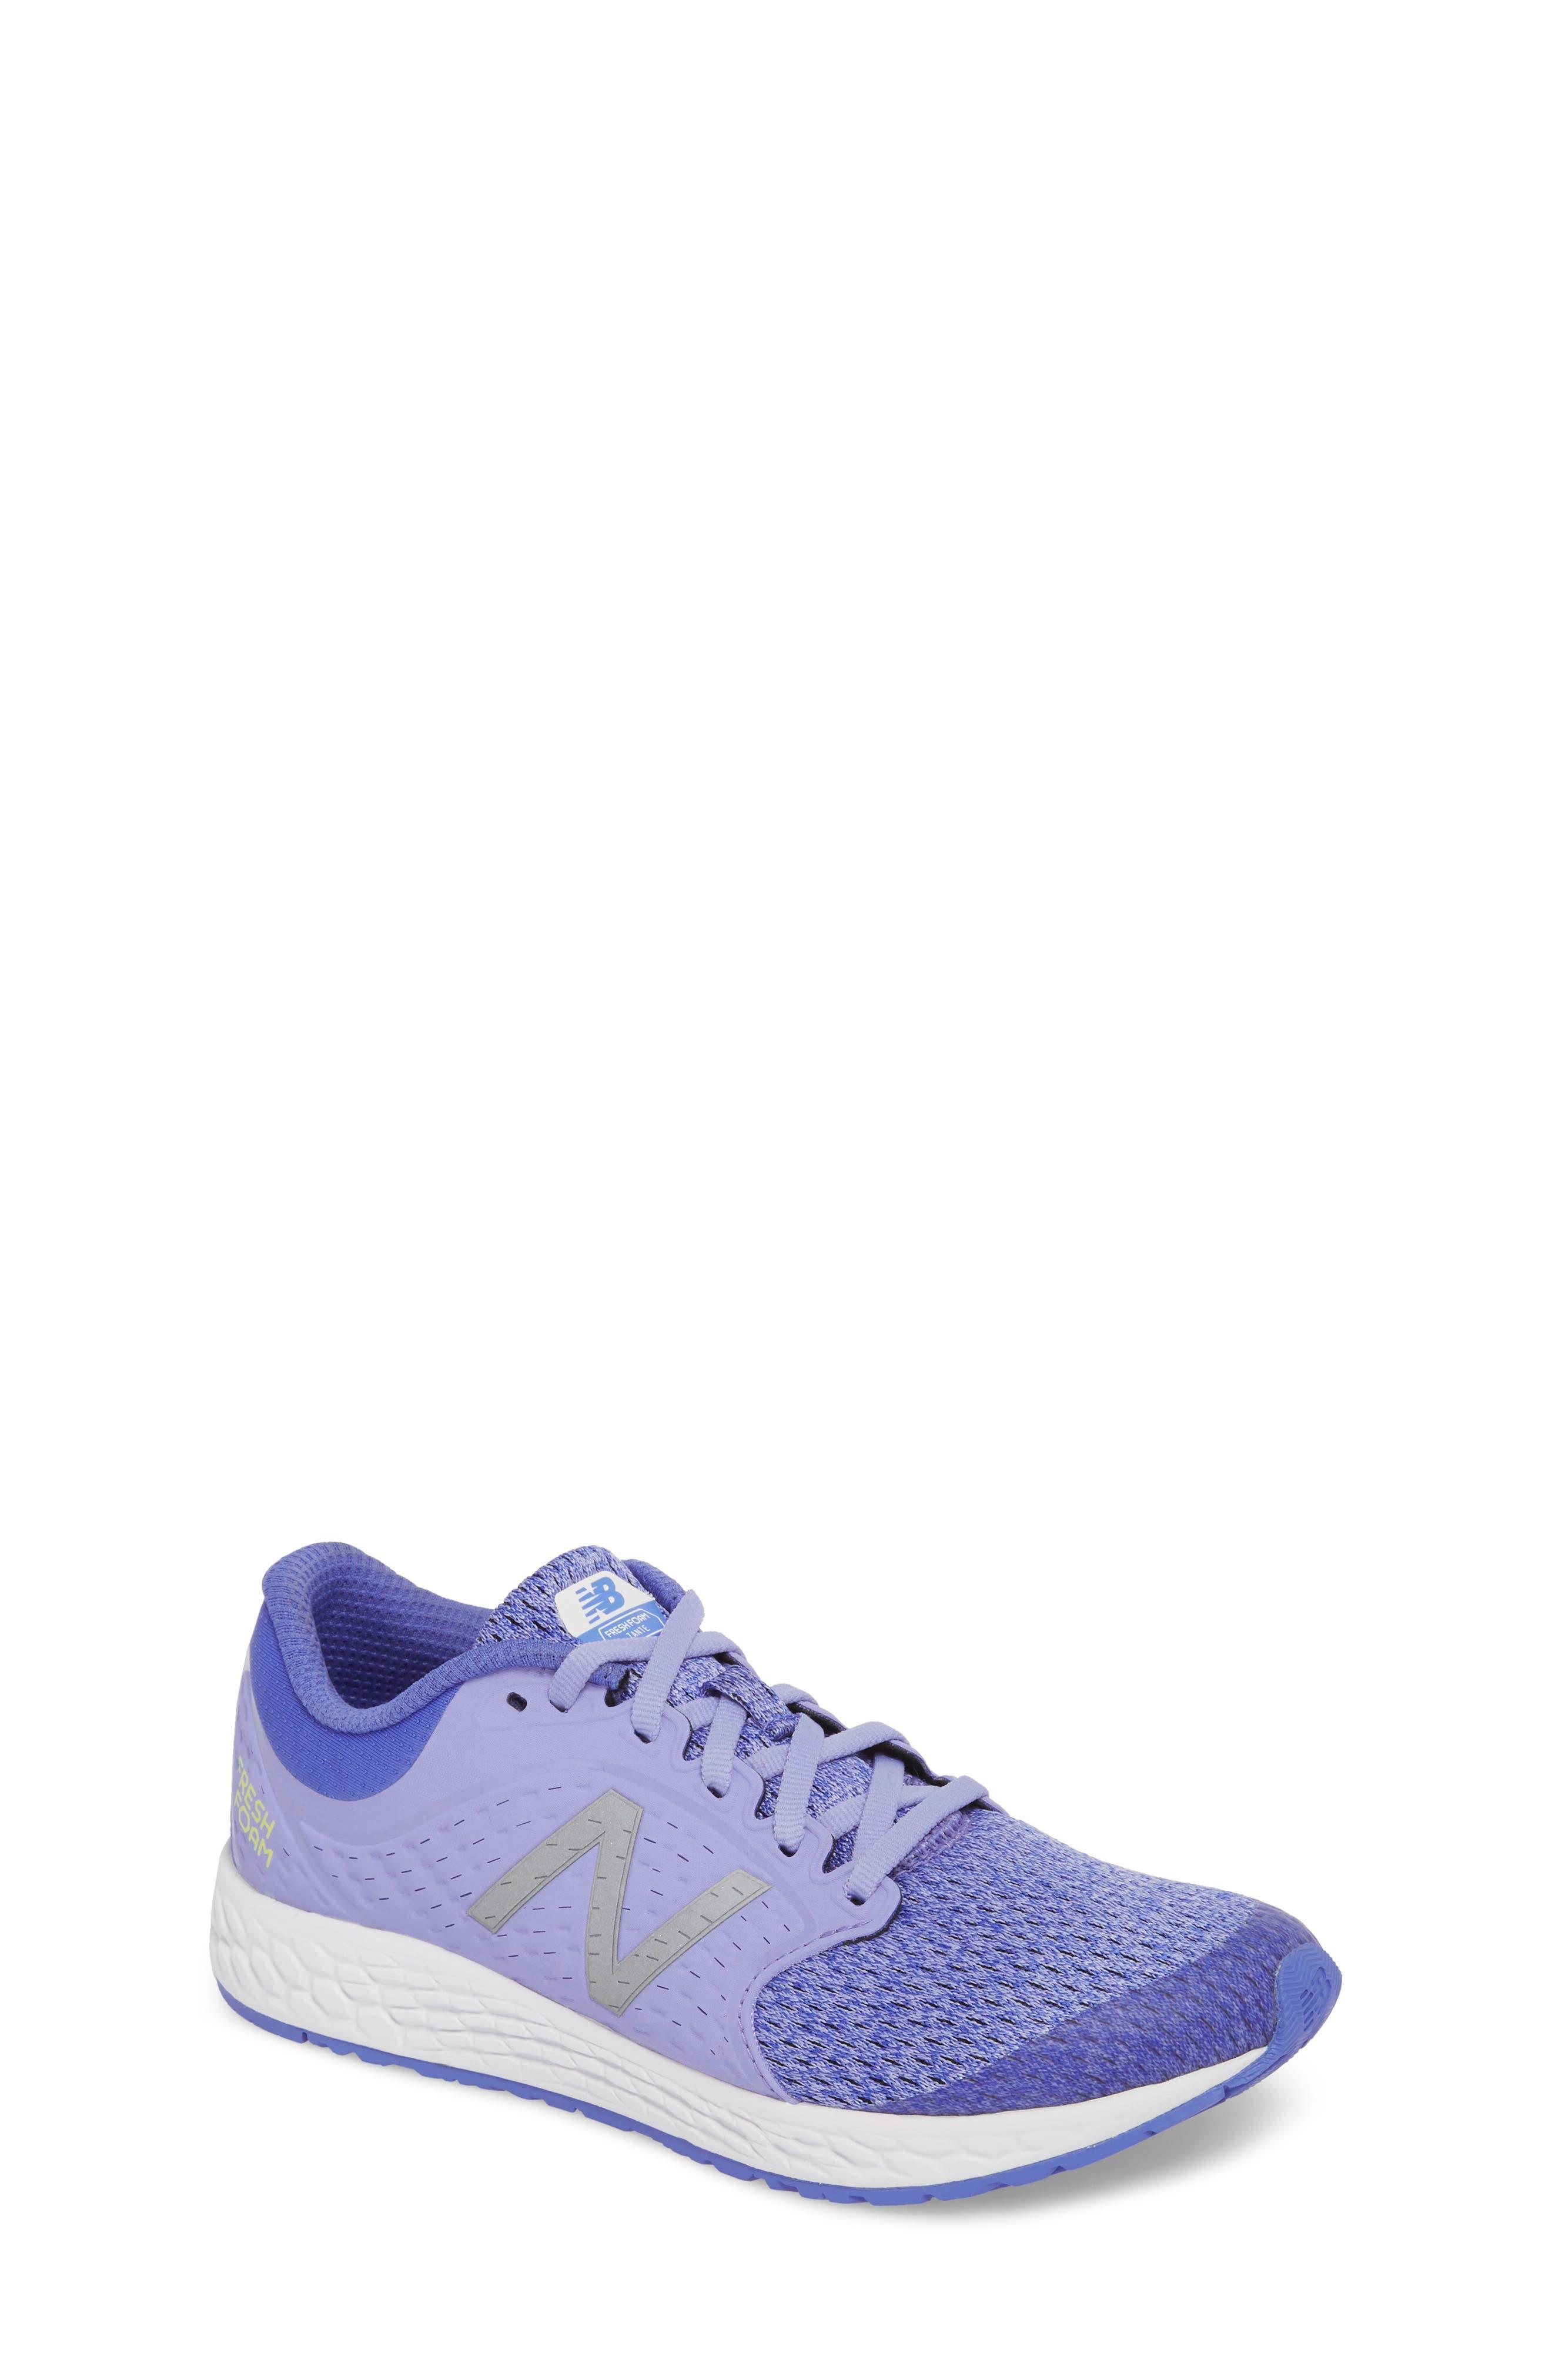 Fresh Foam Zante v4 Running Shoe,                             Main thumbnail 1, color,                             Ice Violet